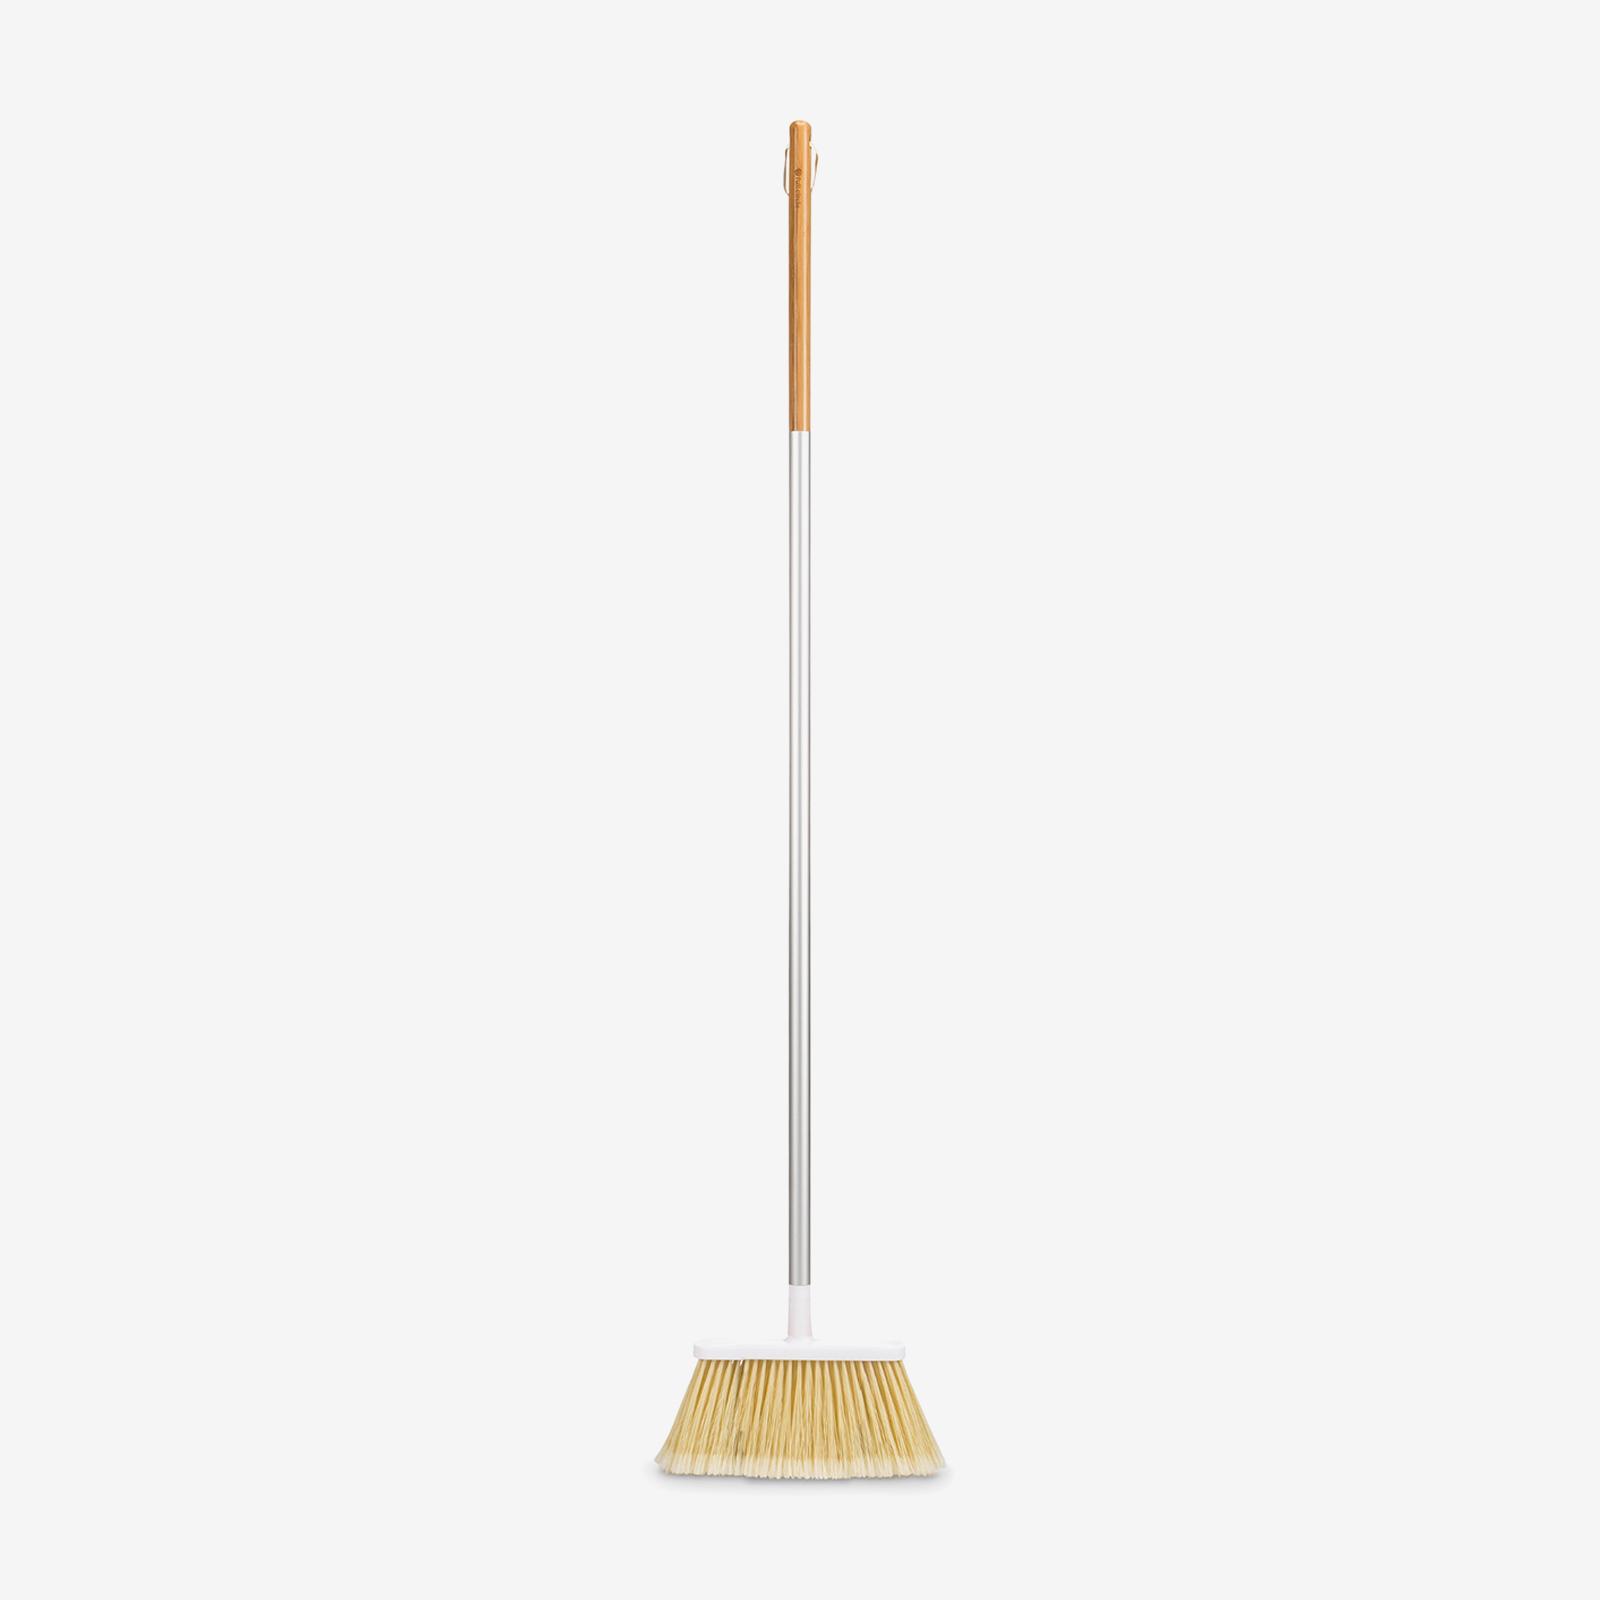 Broom product image